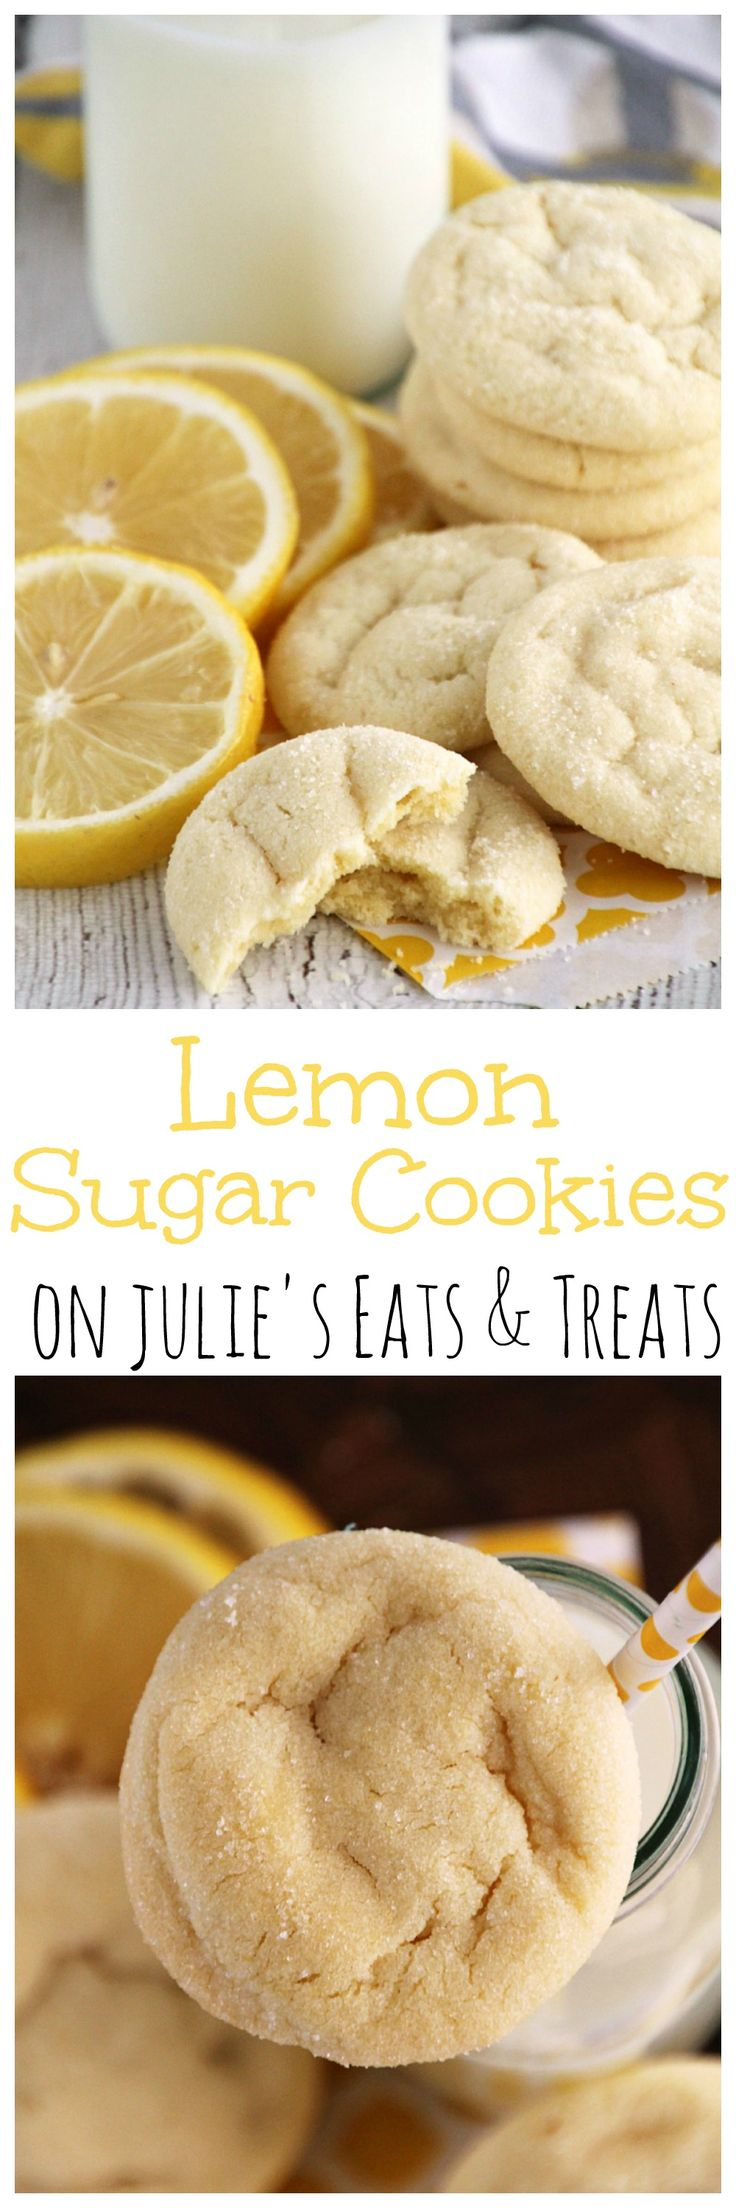 Lemon Sugar Cookies ~ Easy, Soft Lemon Pudding Cookies Rolled in Sugar! ~ http://www.julieseatsandtreats.com